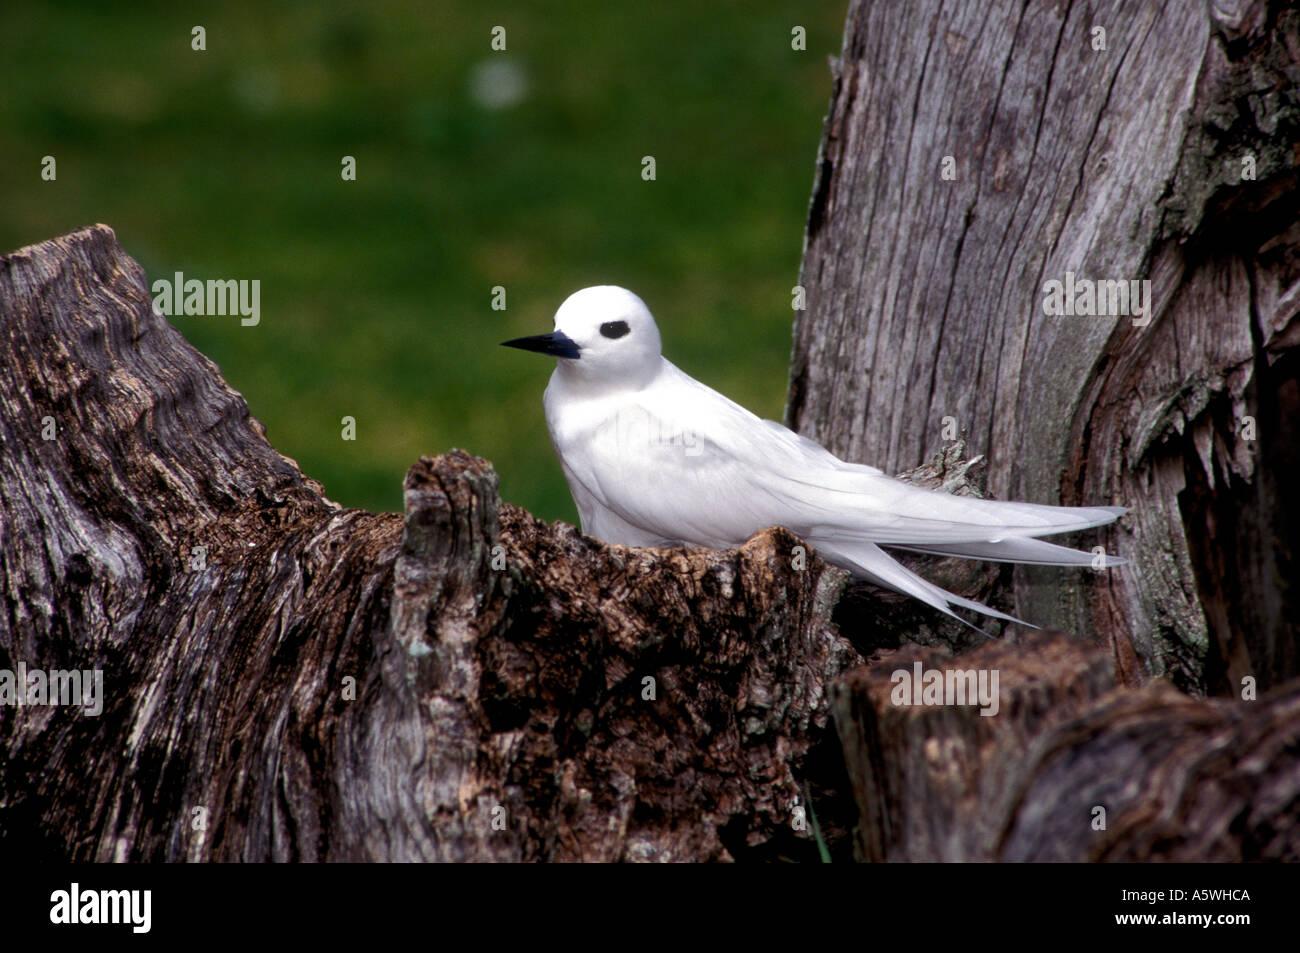 BT2-12 WHITE TERN ON DEAD TREE - Stock Image